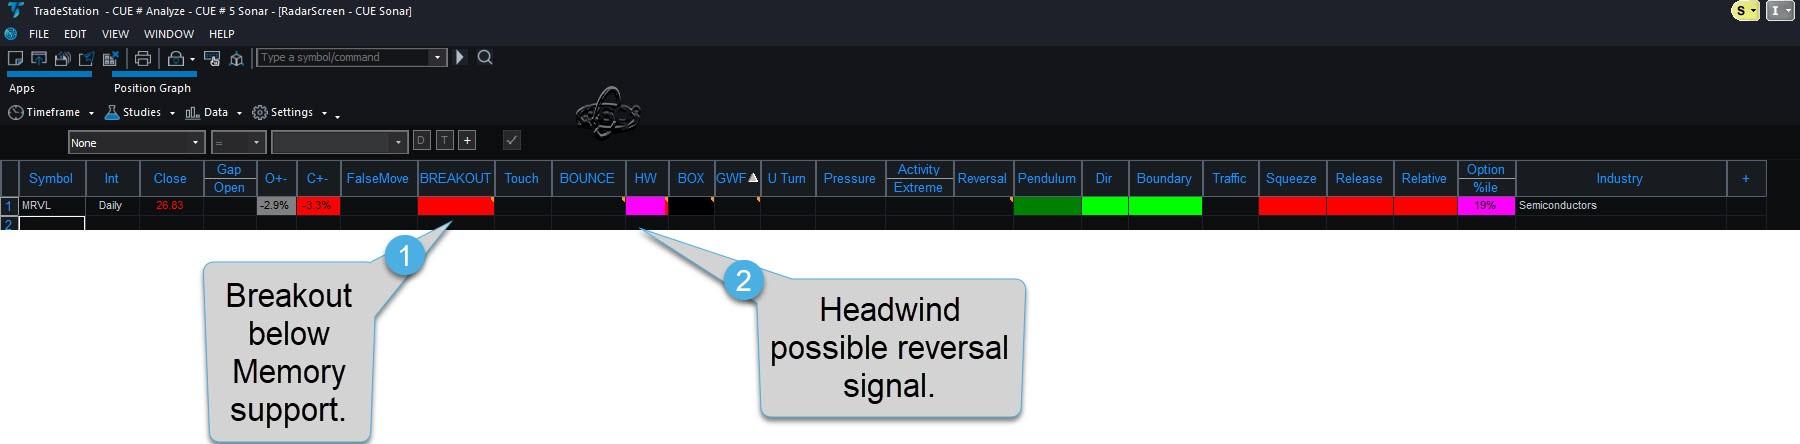 6 0 radar.jpg